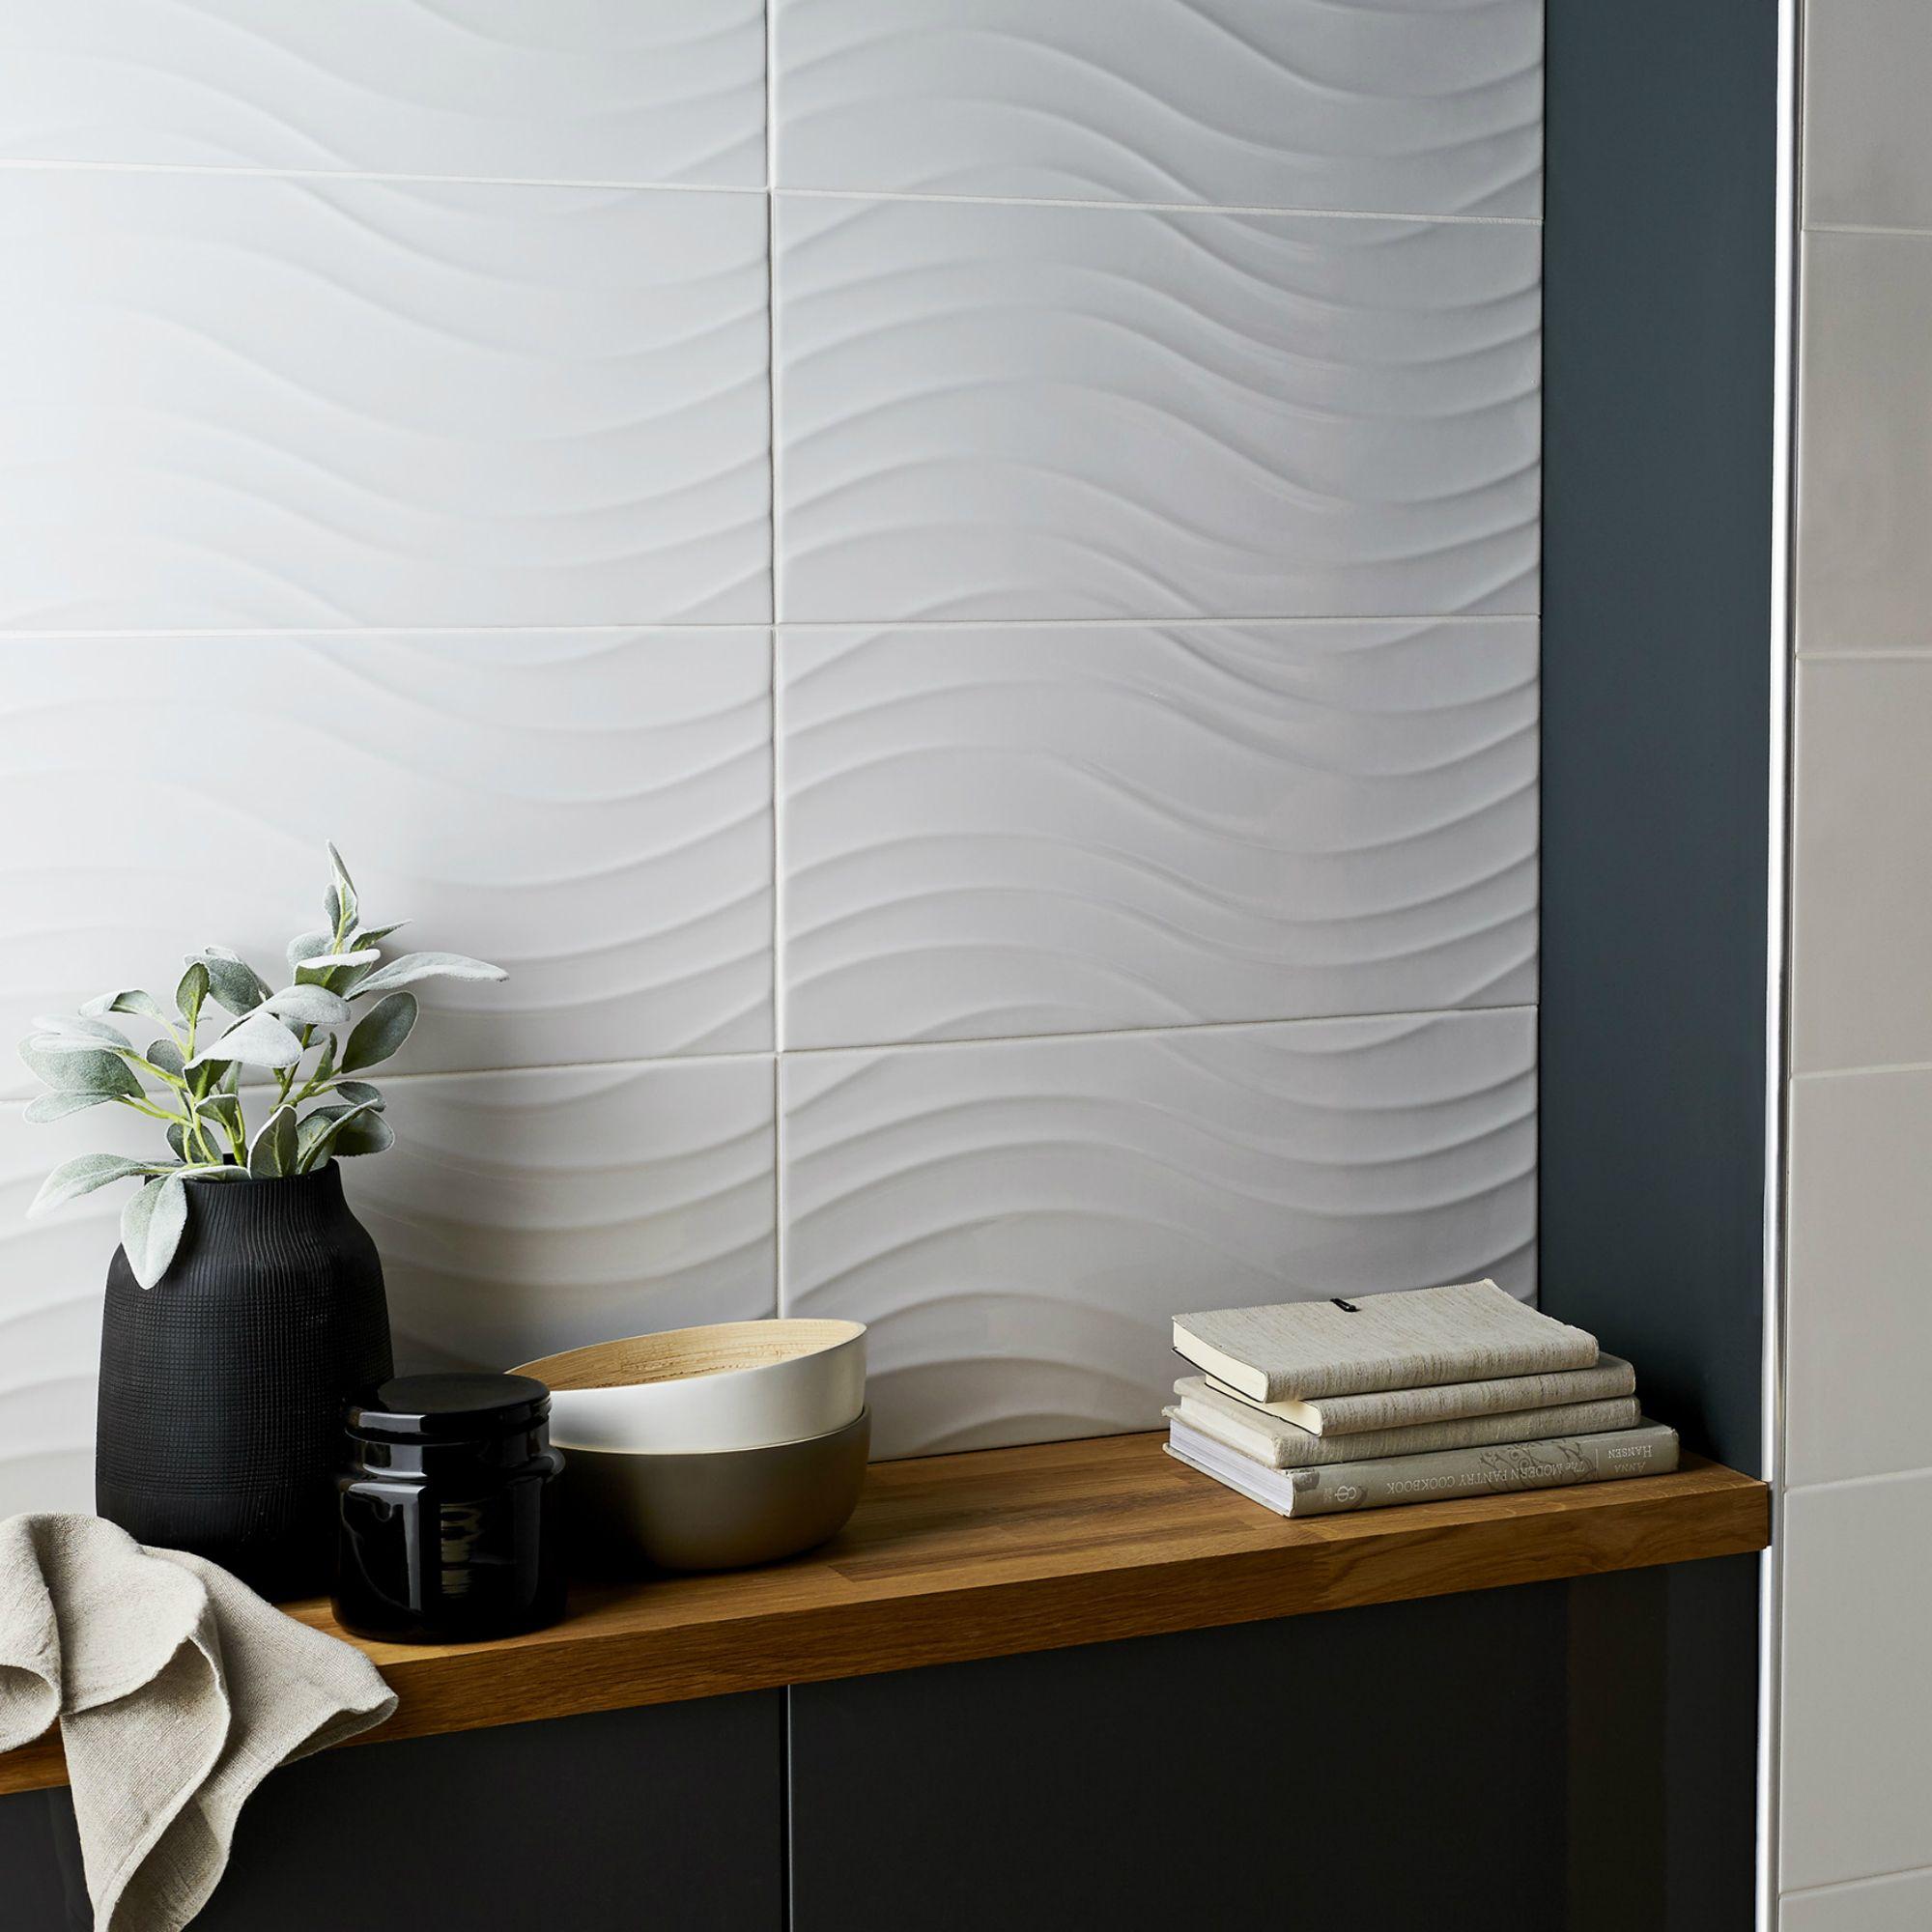 Catanzaro White Gloss Wave Ceramic Wall tile, Sample,